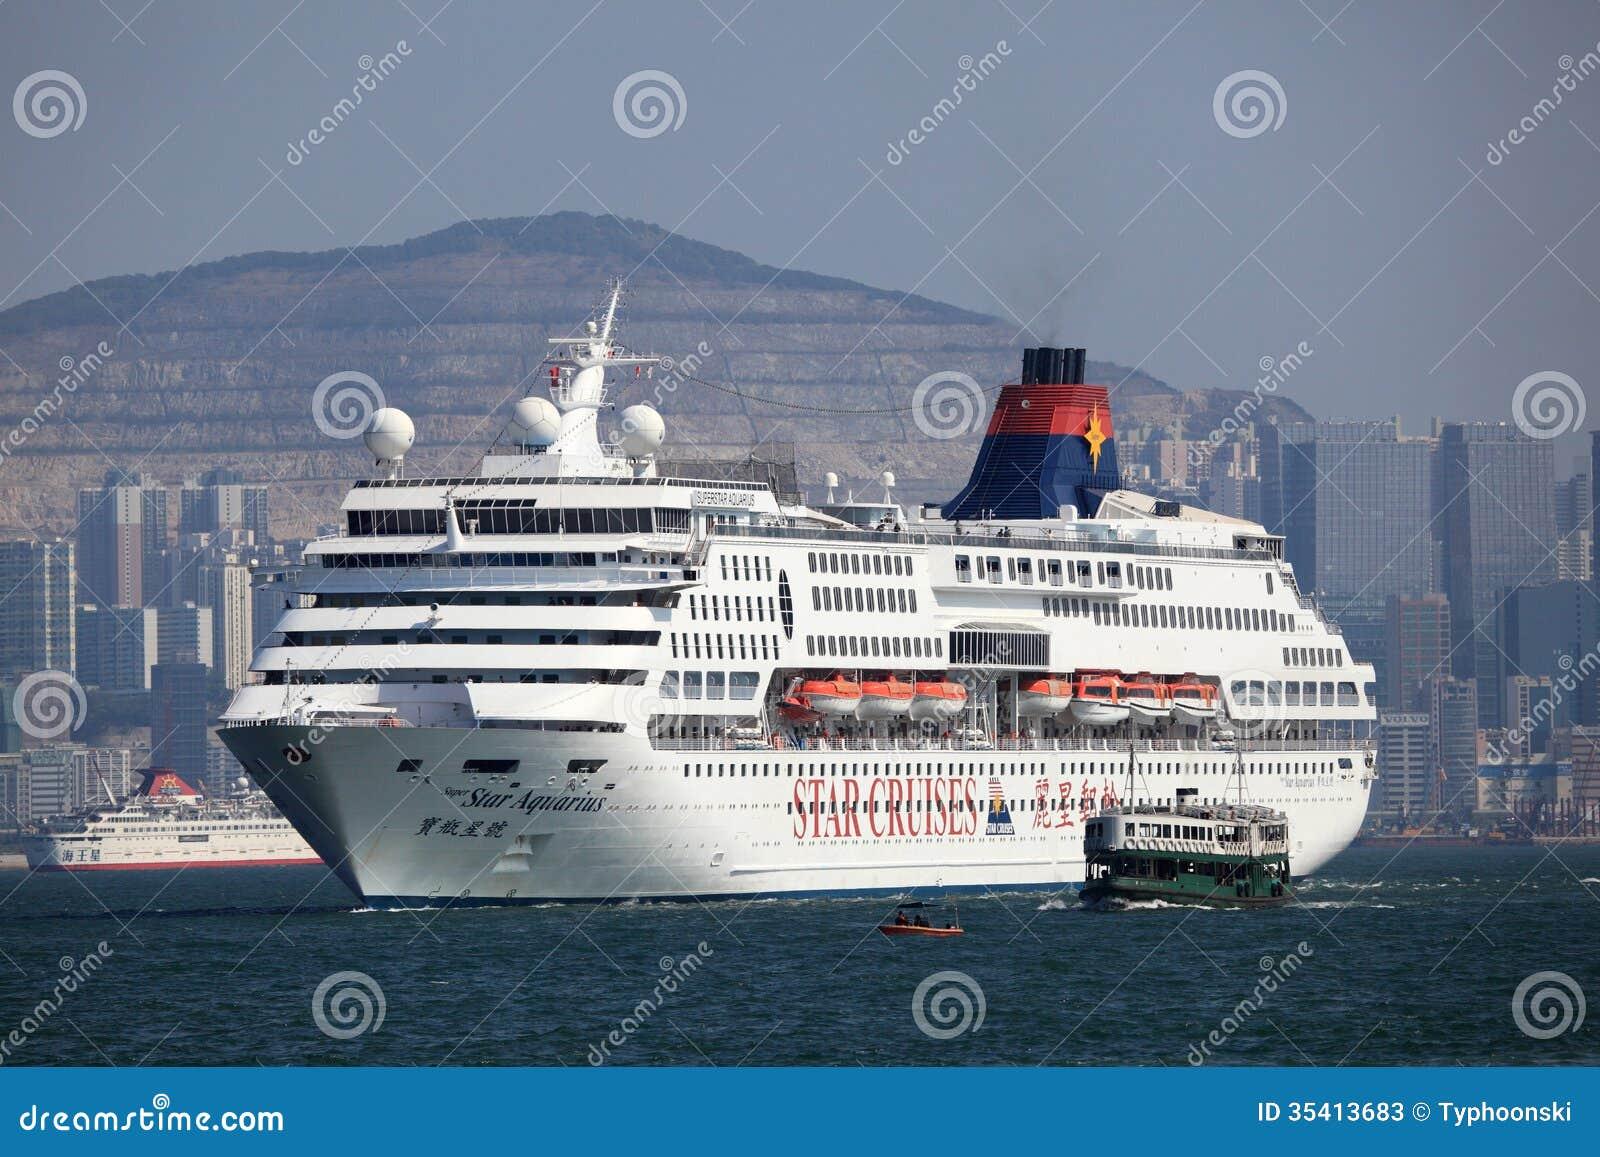 Cruise ship in Hong Kong editorial stock photo. Image of ...